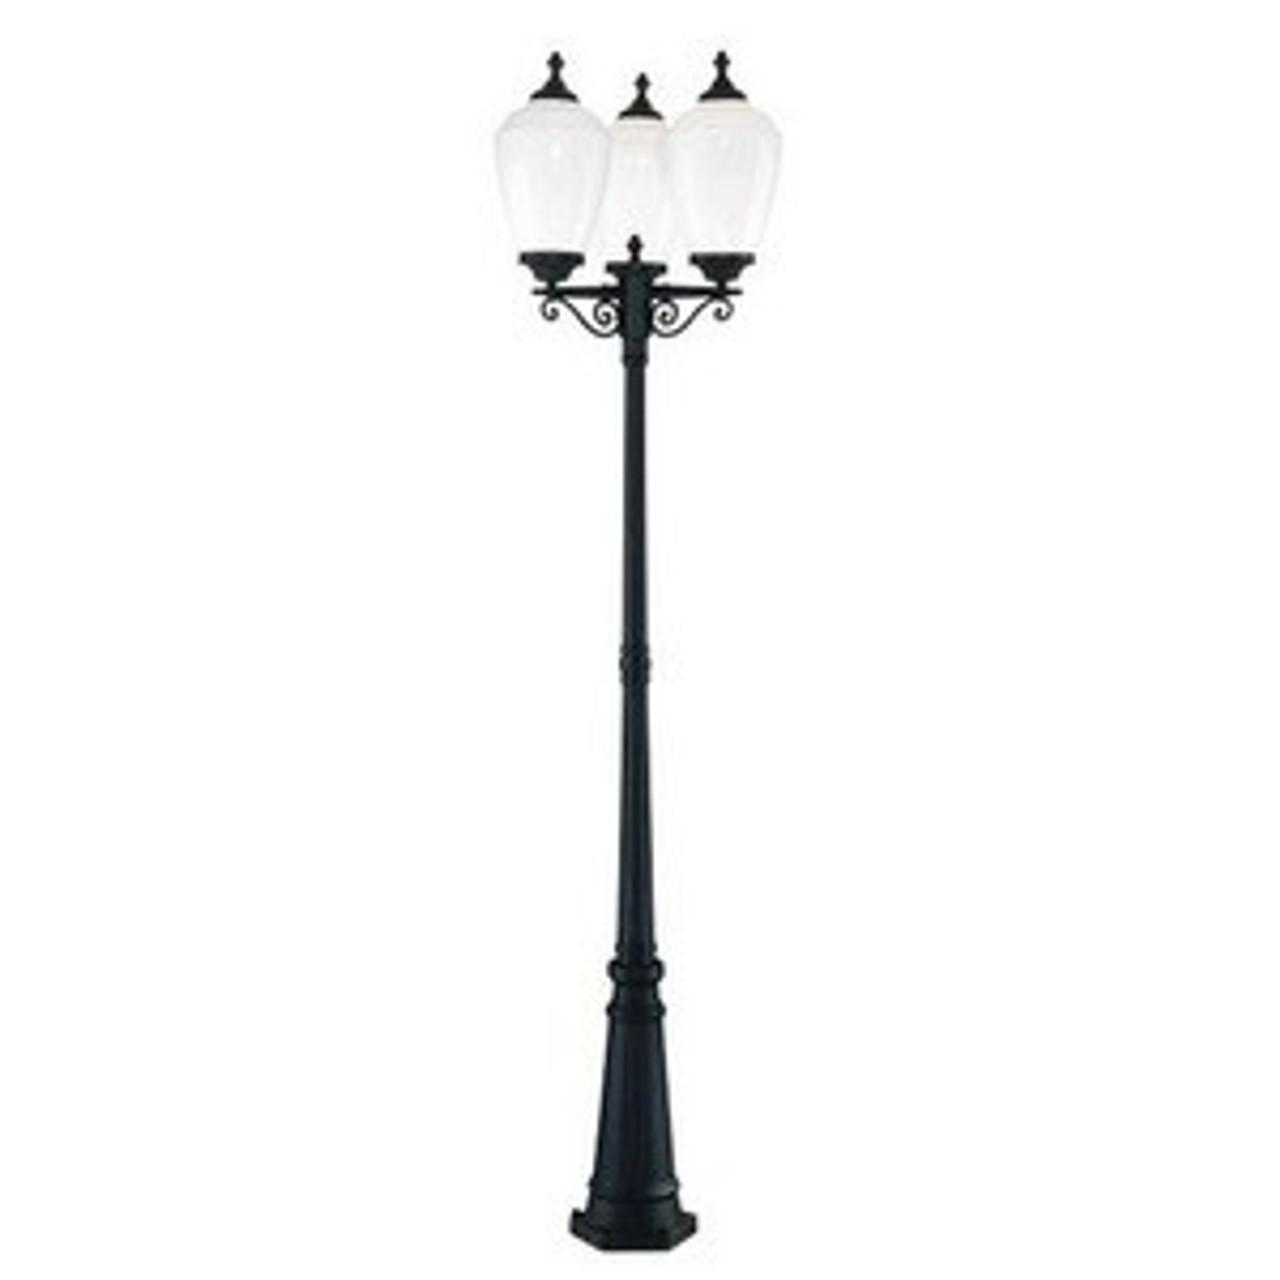 Acorn Three Light Post Lantern by Acclaim Lighting, Matte Black Finish with Opal Acrylic Glass (5369BK-WH)